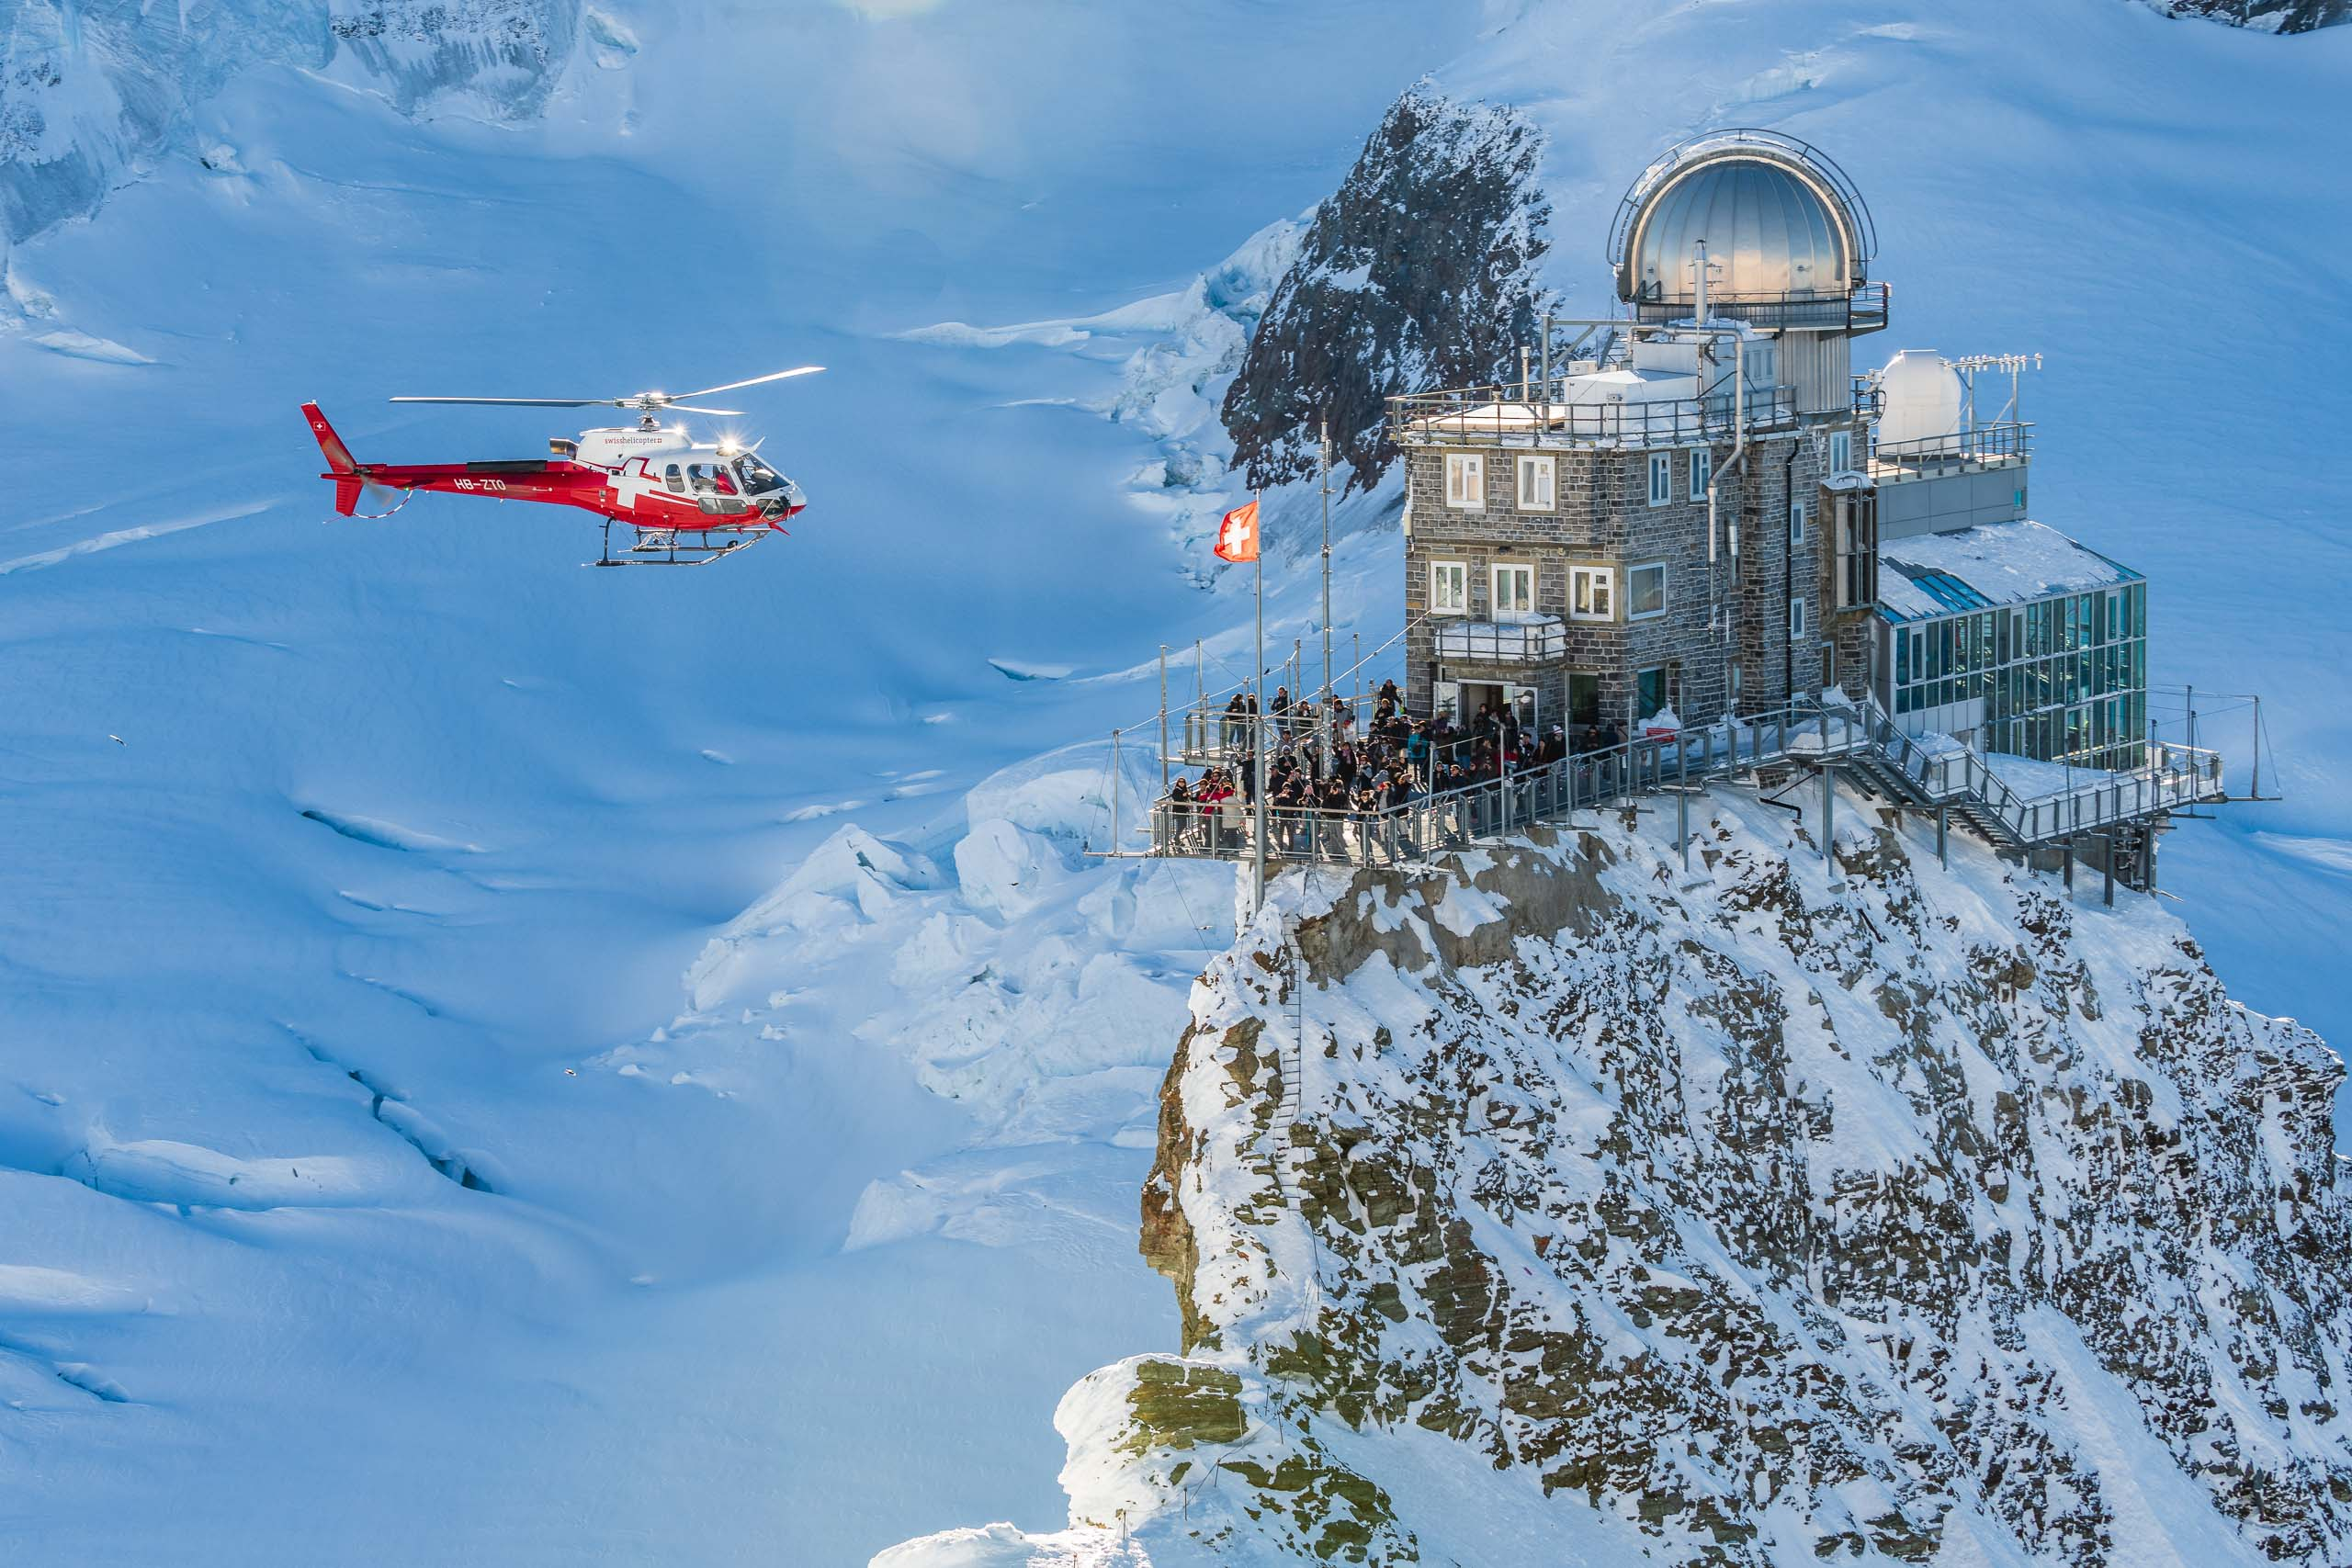 A85_0787_helikopterflug_jungfraujoch